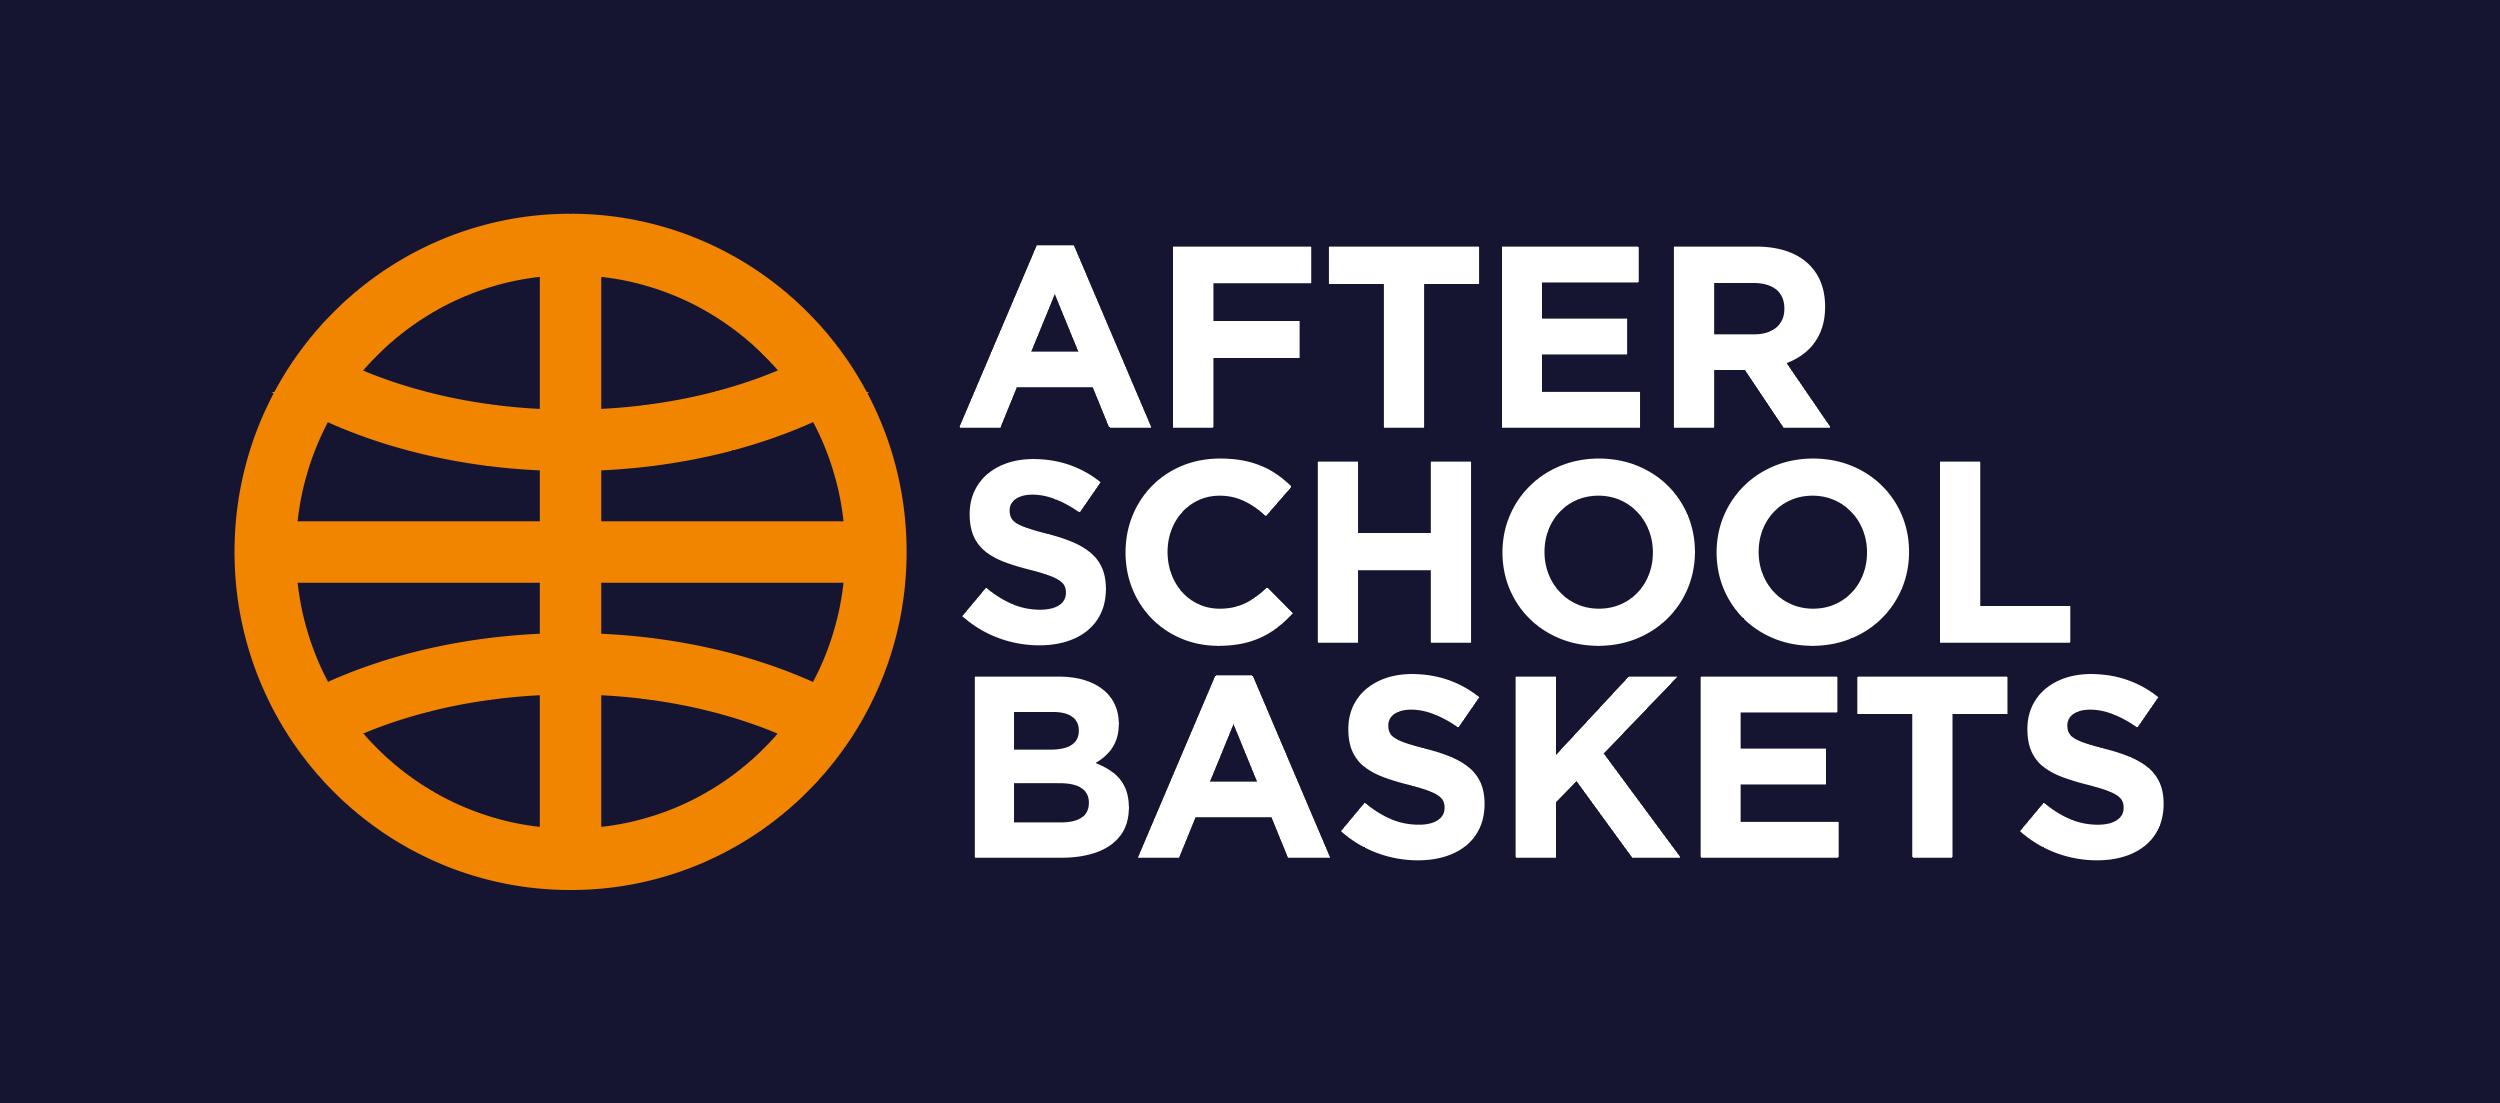 After School Baskets Flyer